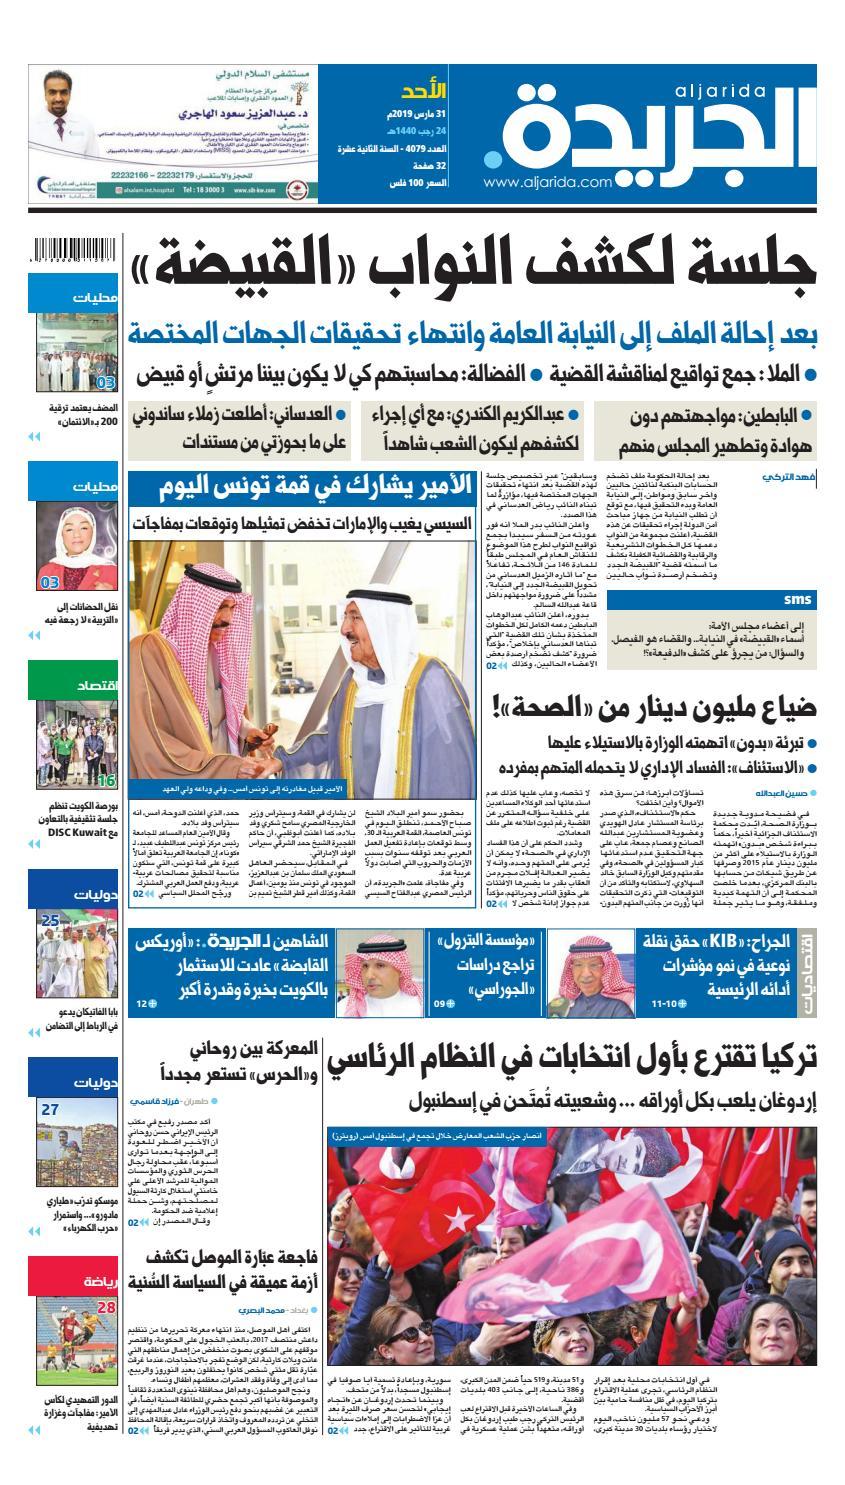 c6551d4f0 عدد الجريدة الأحد 31 مارس 2019 by Aljarida Newspaper - issuu